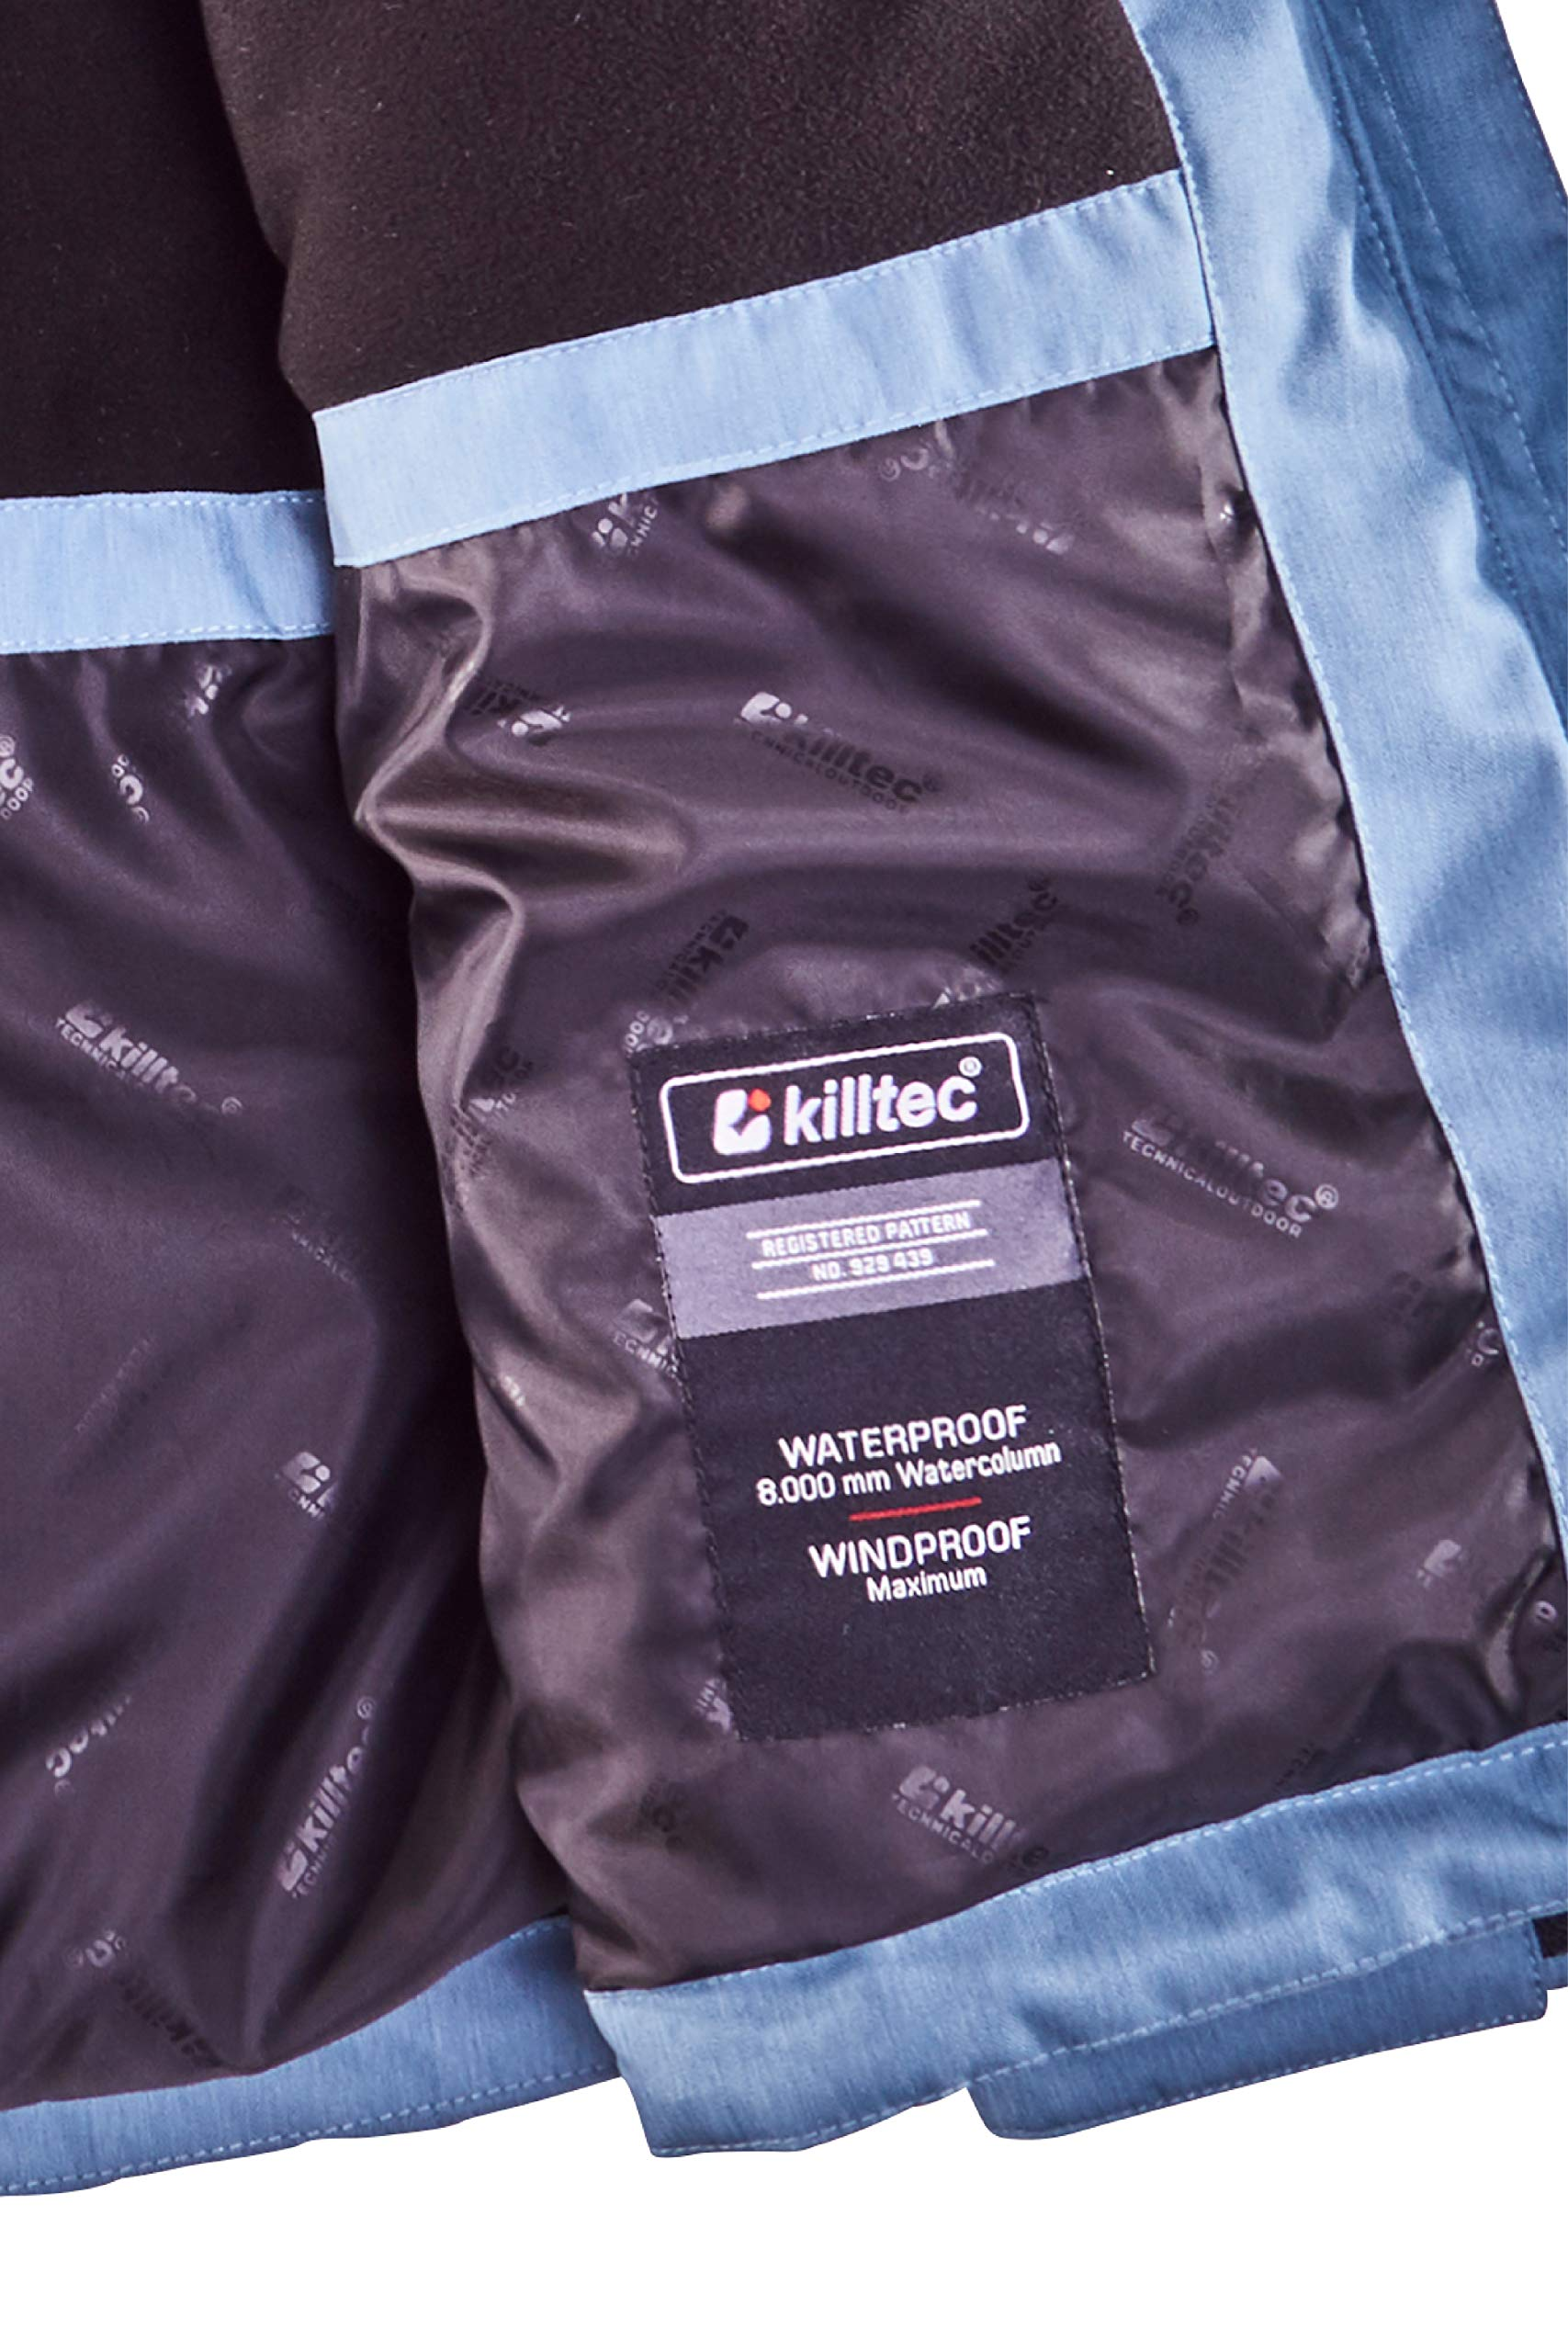 816UEQgYTmL - killtec Women's Zala Functional Jacket with Zip-Off Hood